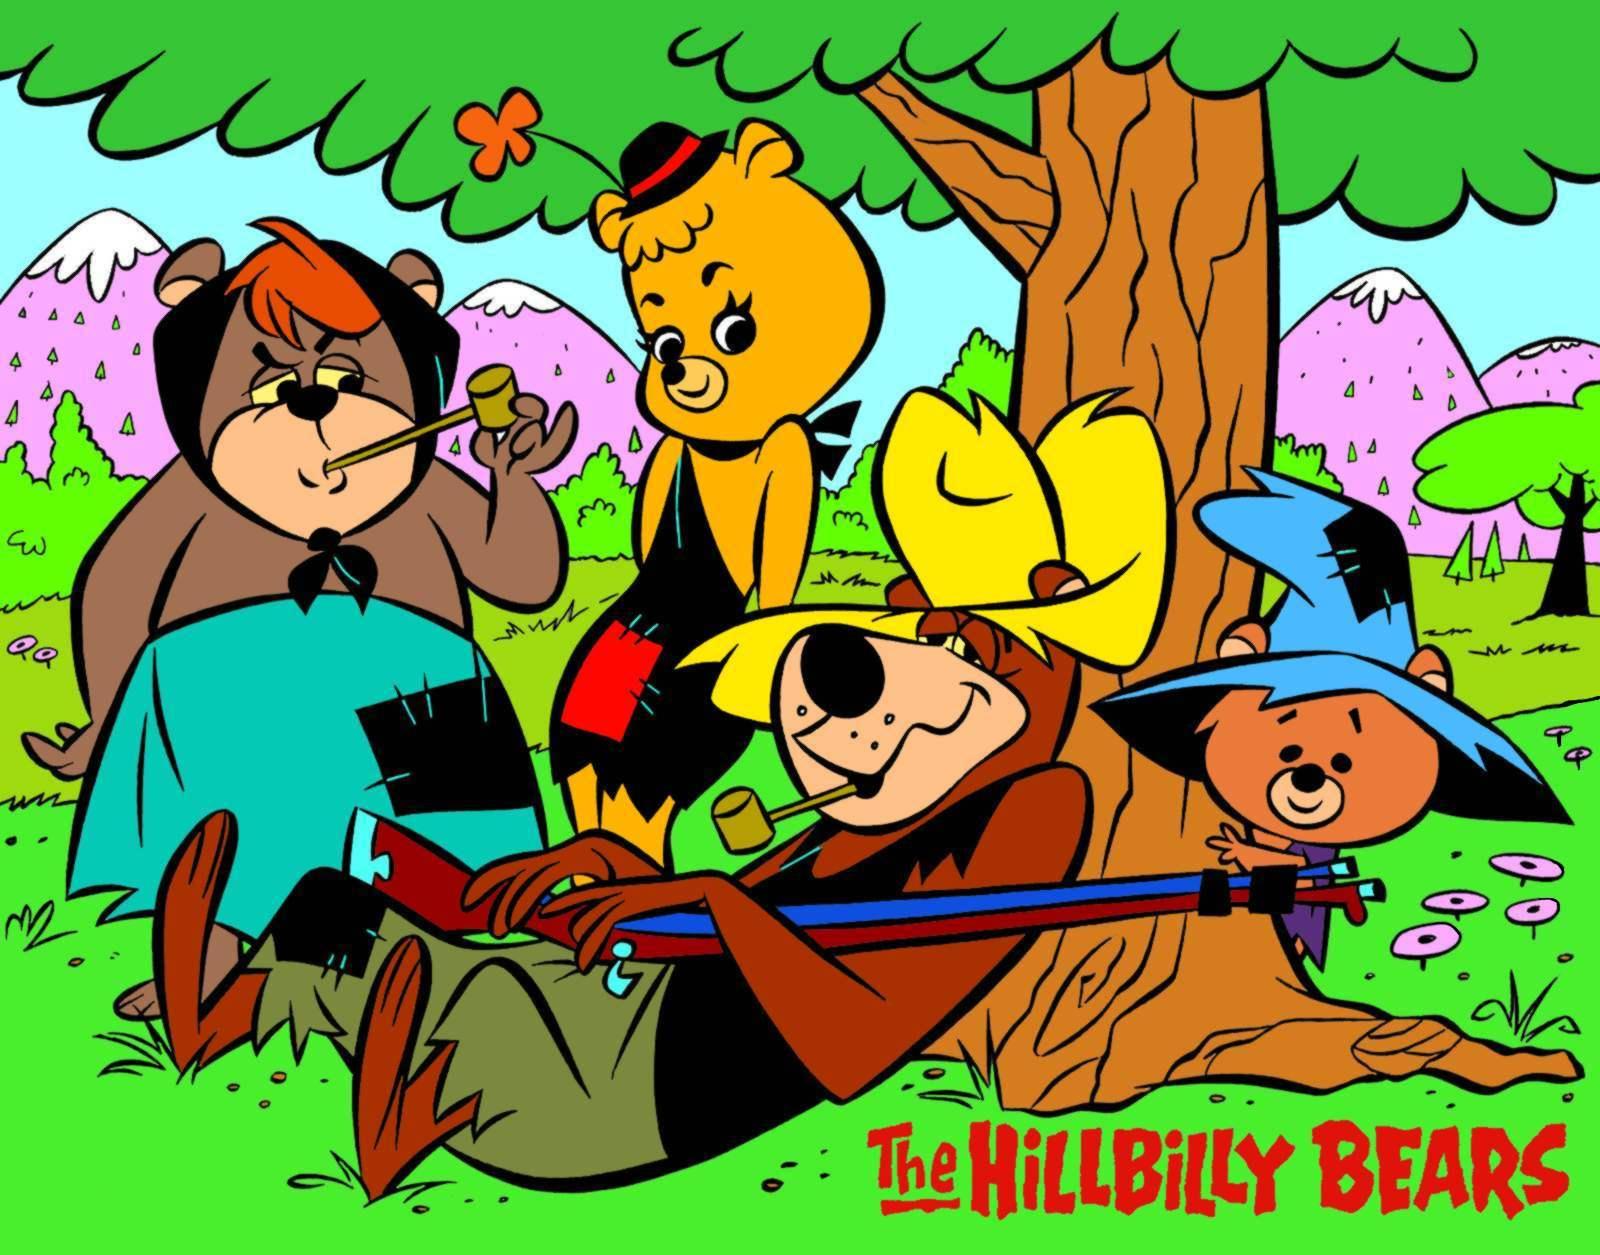 Hanna barbera cartoon hillbilly bears